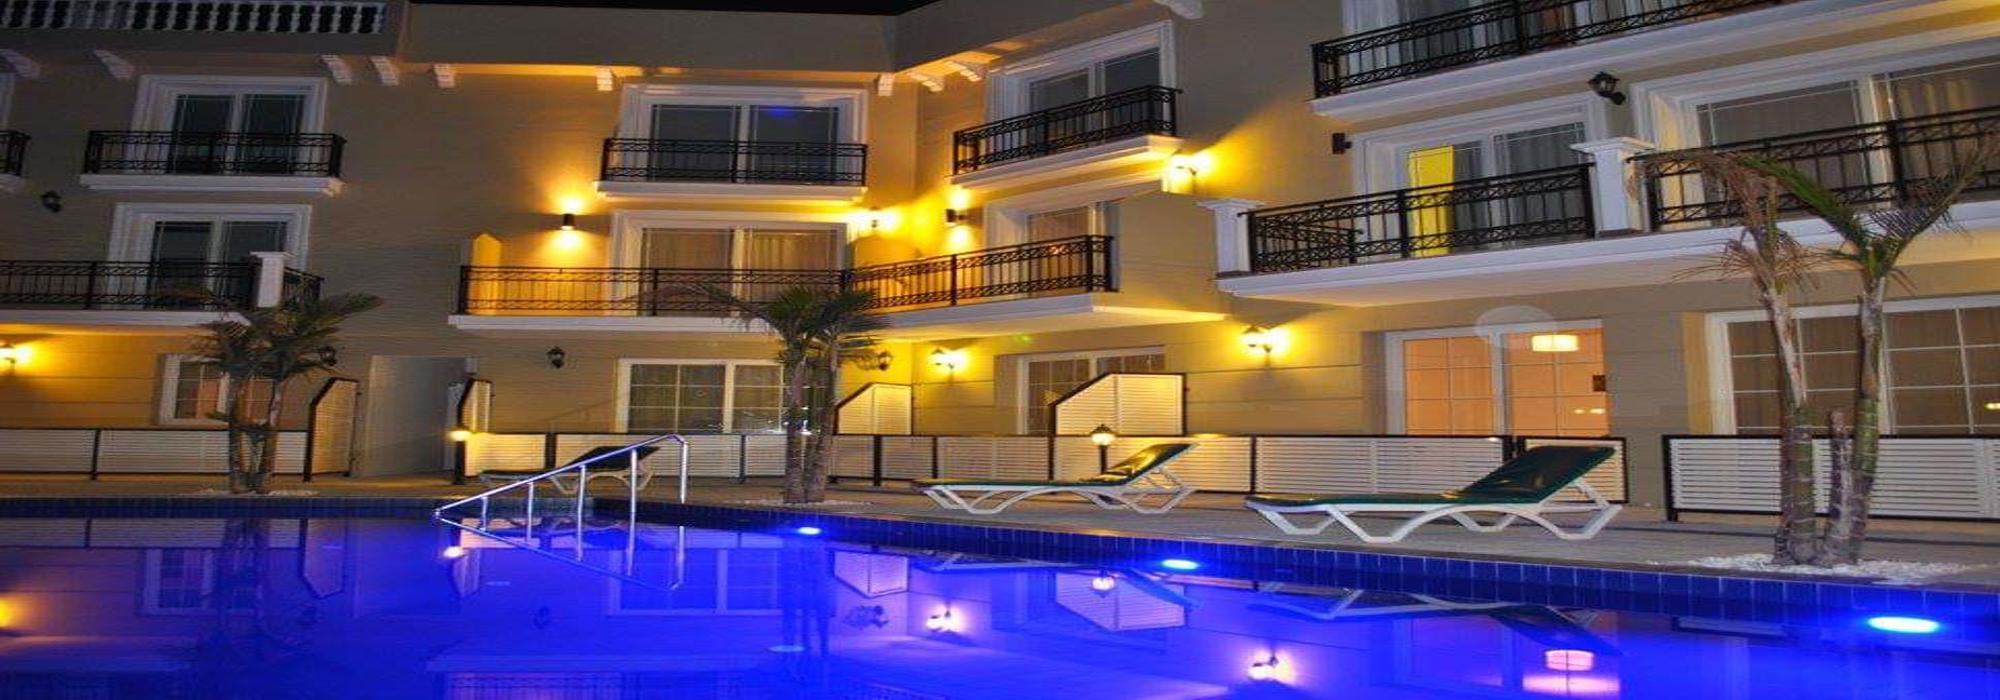 2 Bedroom Apartment For Rent Location Near By Alsancak Belediye (Communal Swimming Pool)